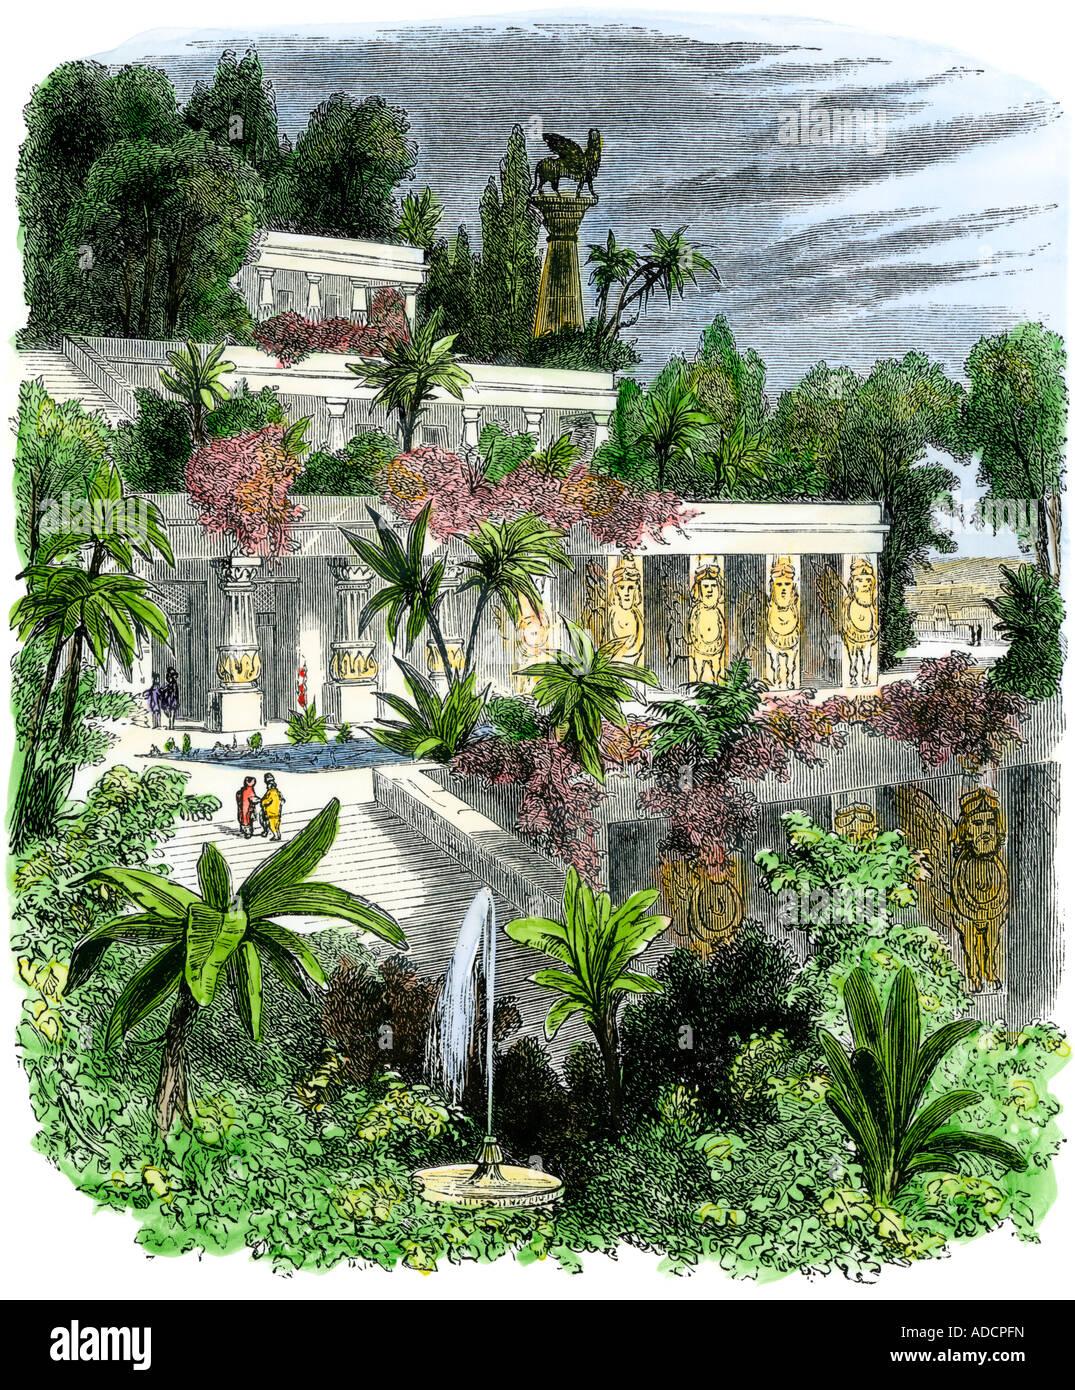 Giardini pensili di babilonia antica foto immagine stock - Giardini pensili immagini ...